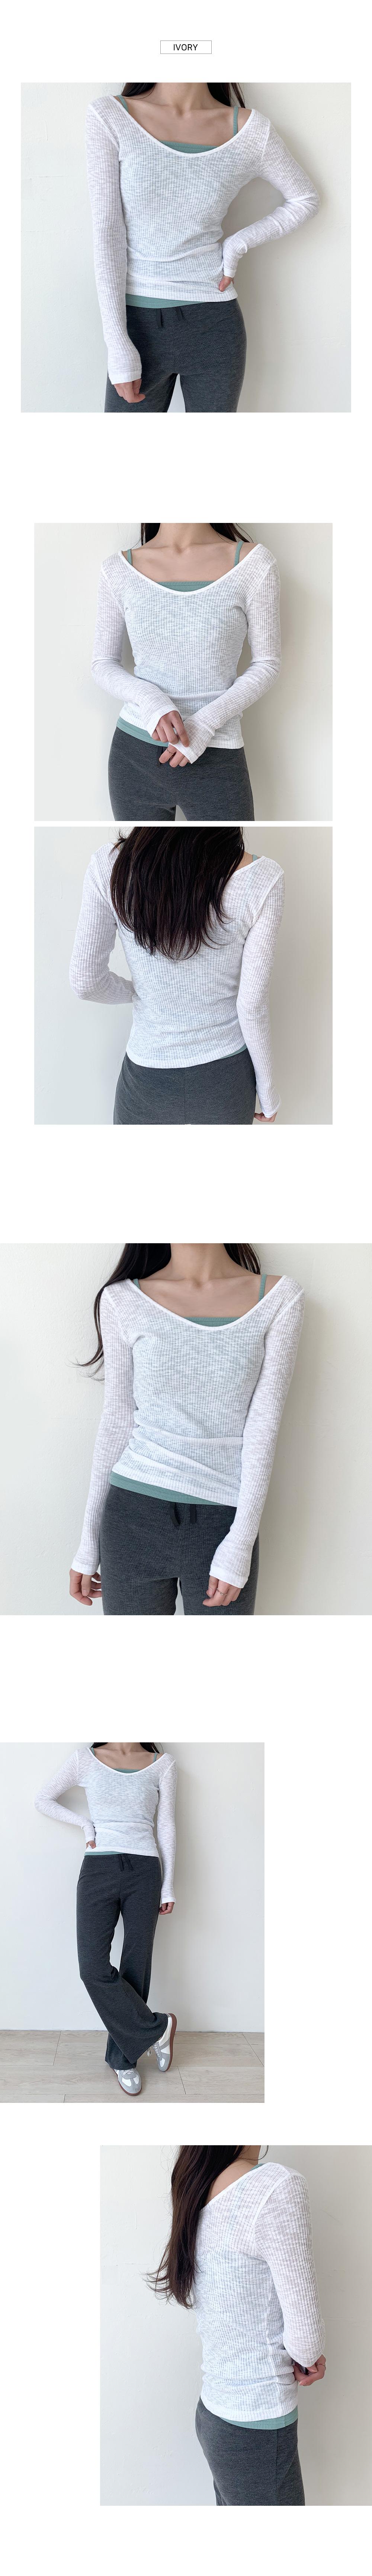 Round ribbed t-shirt